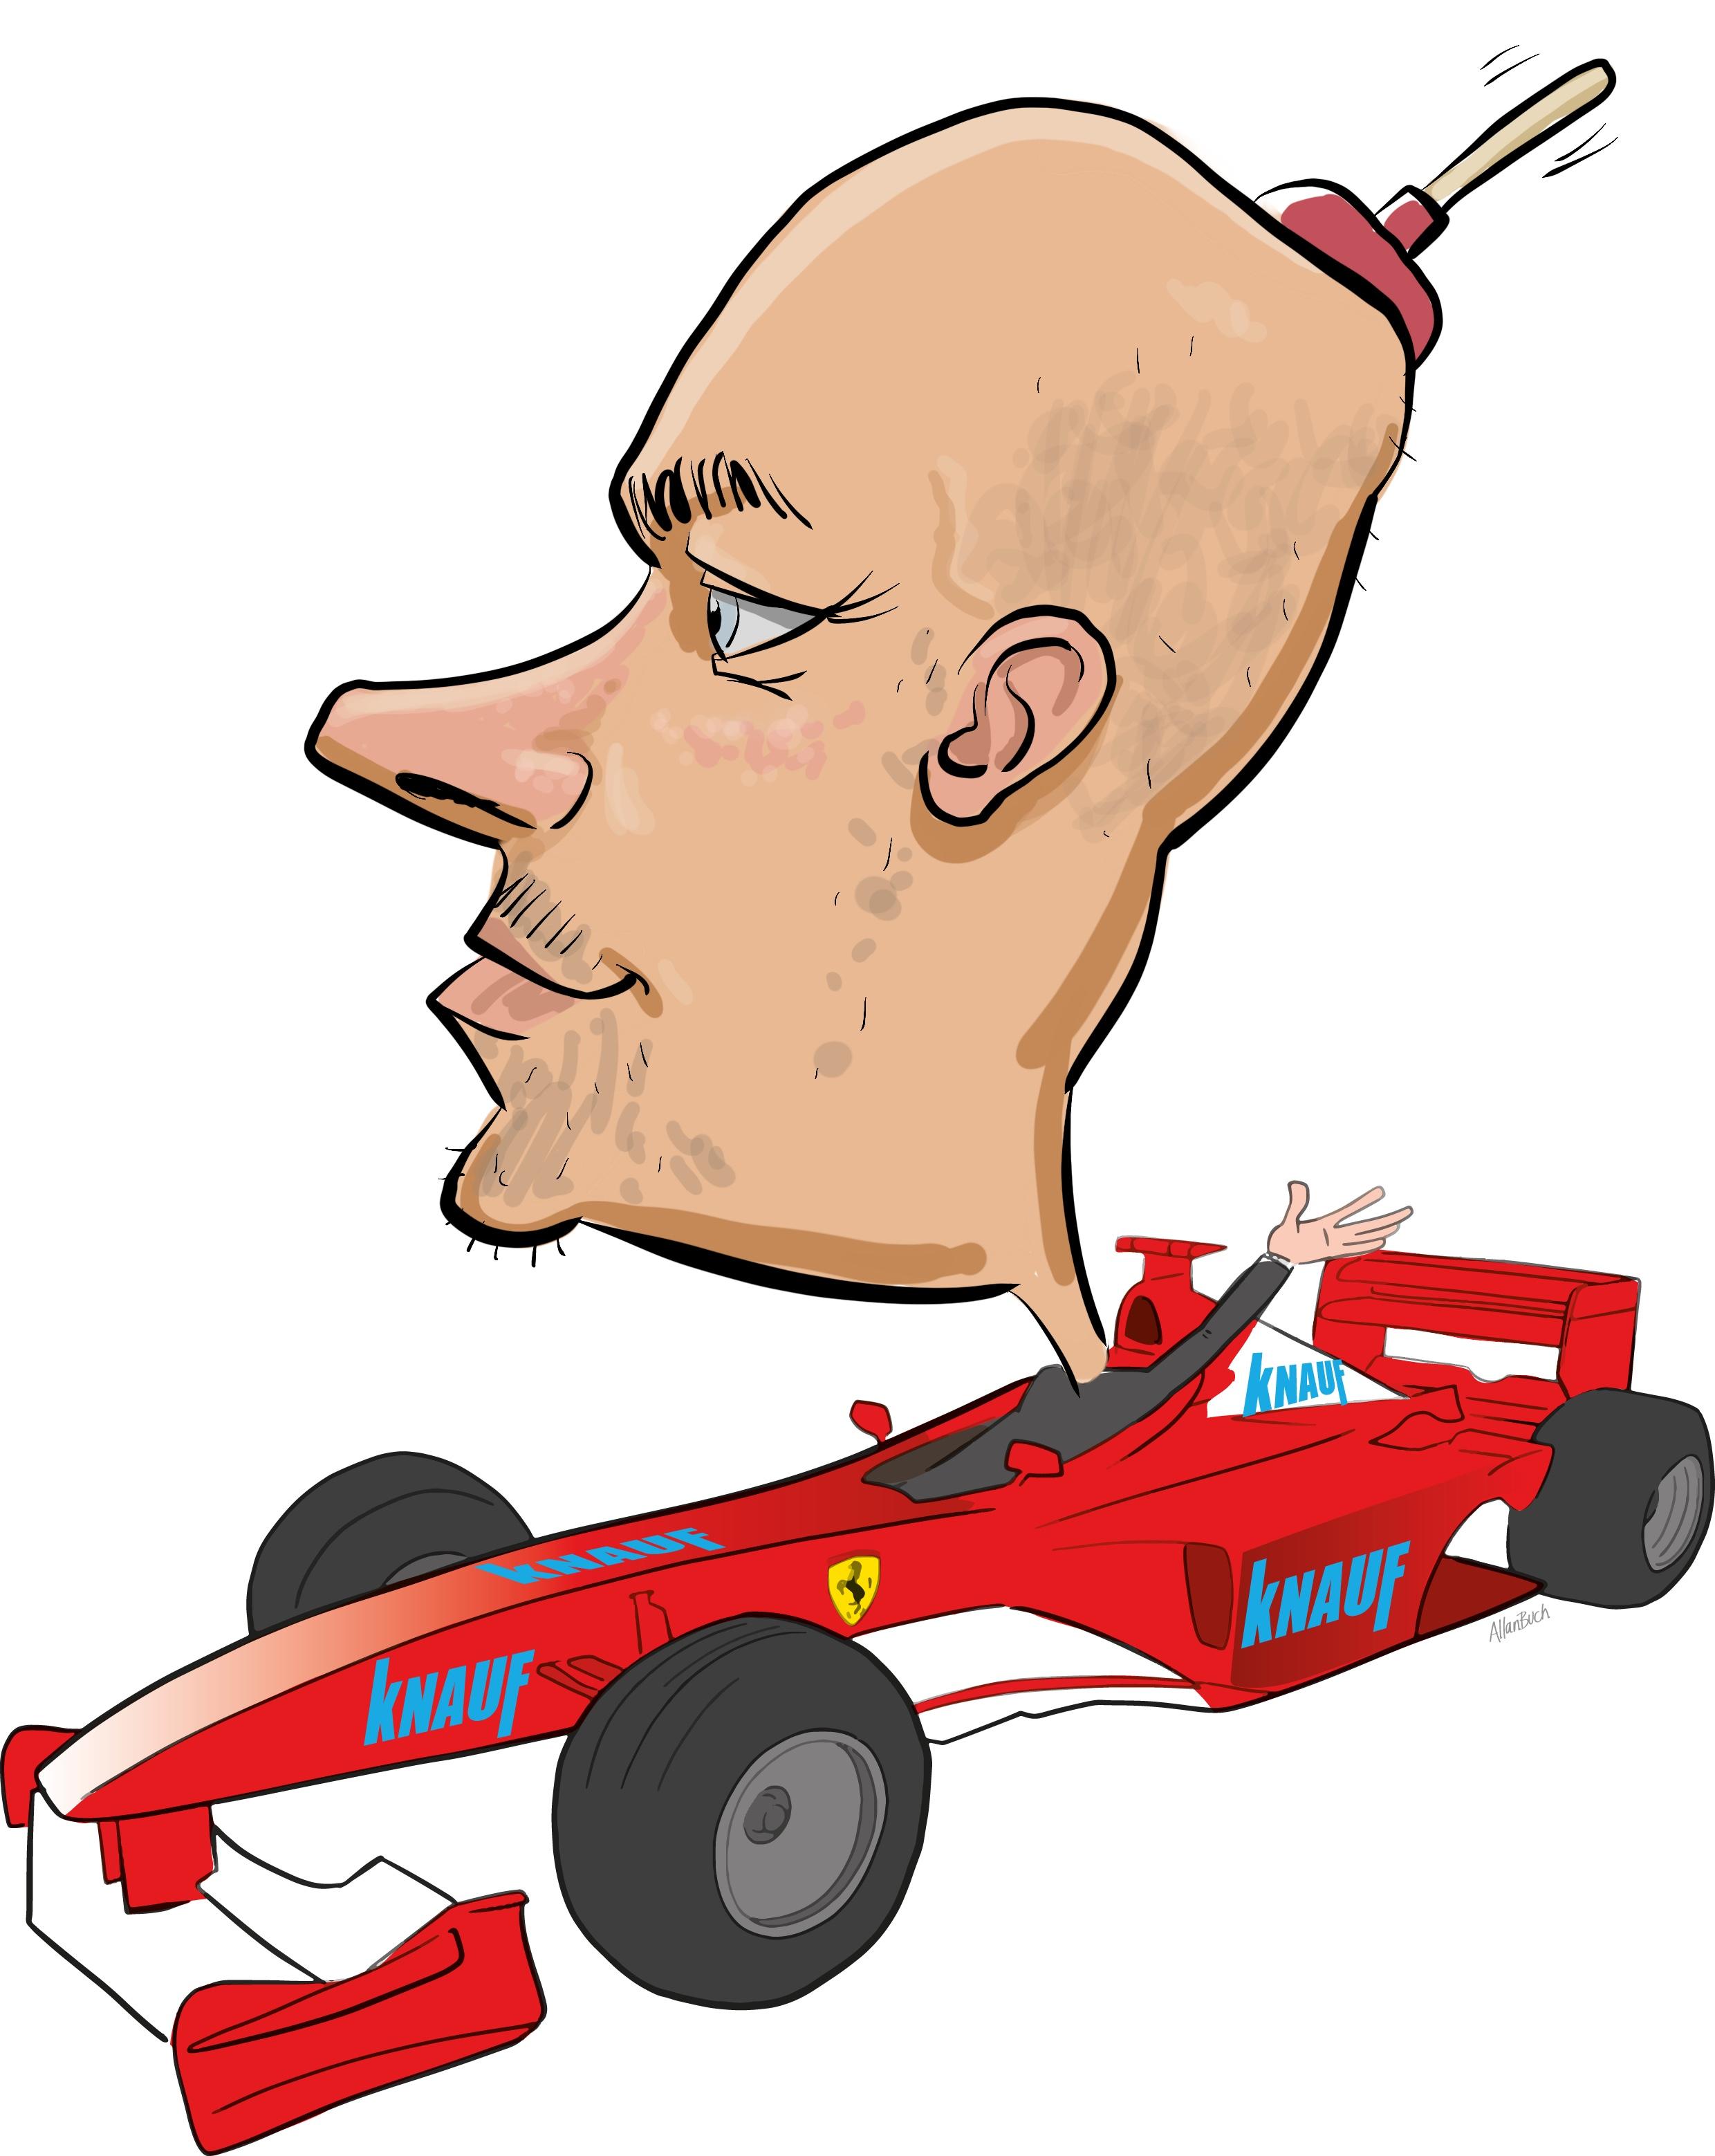 ipad Live karikatur med Allan Buch. farve profiltegning18